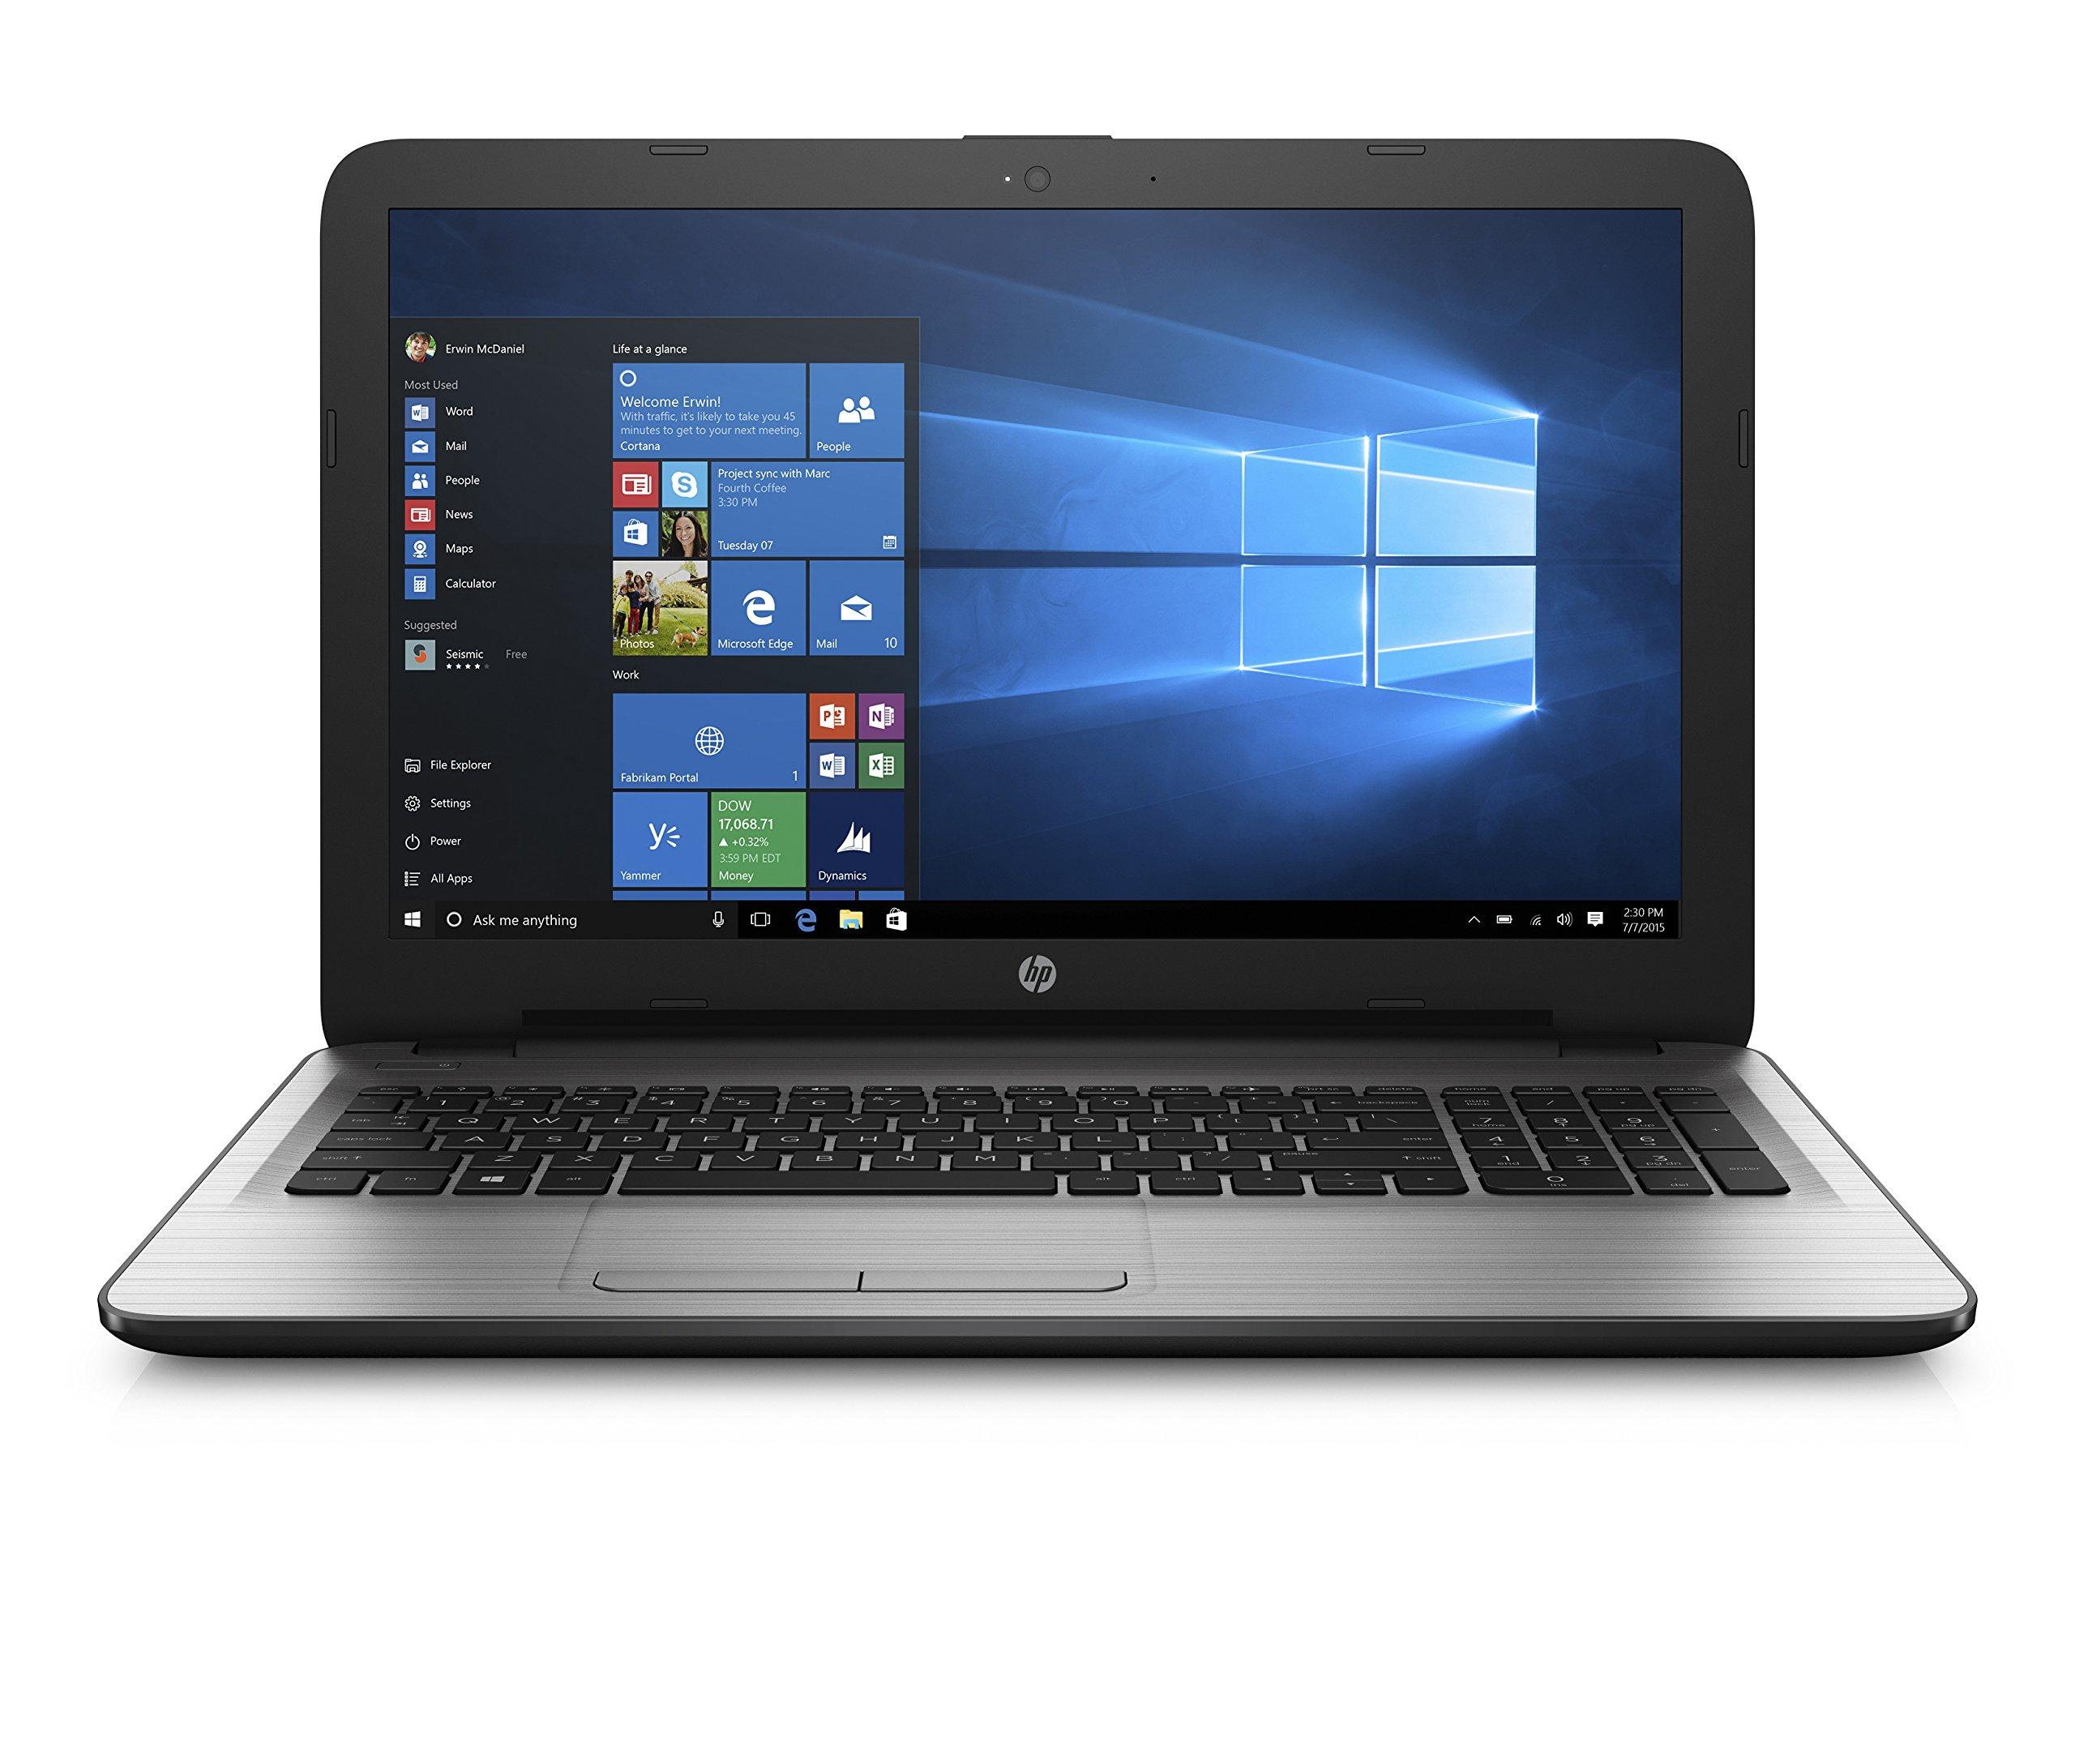 "HP 15-ay010nr 15.6"" HD Laptop (Intel Pentium N3710, 4GB RAM, 1TB HDD) with Windows 10"